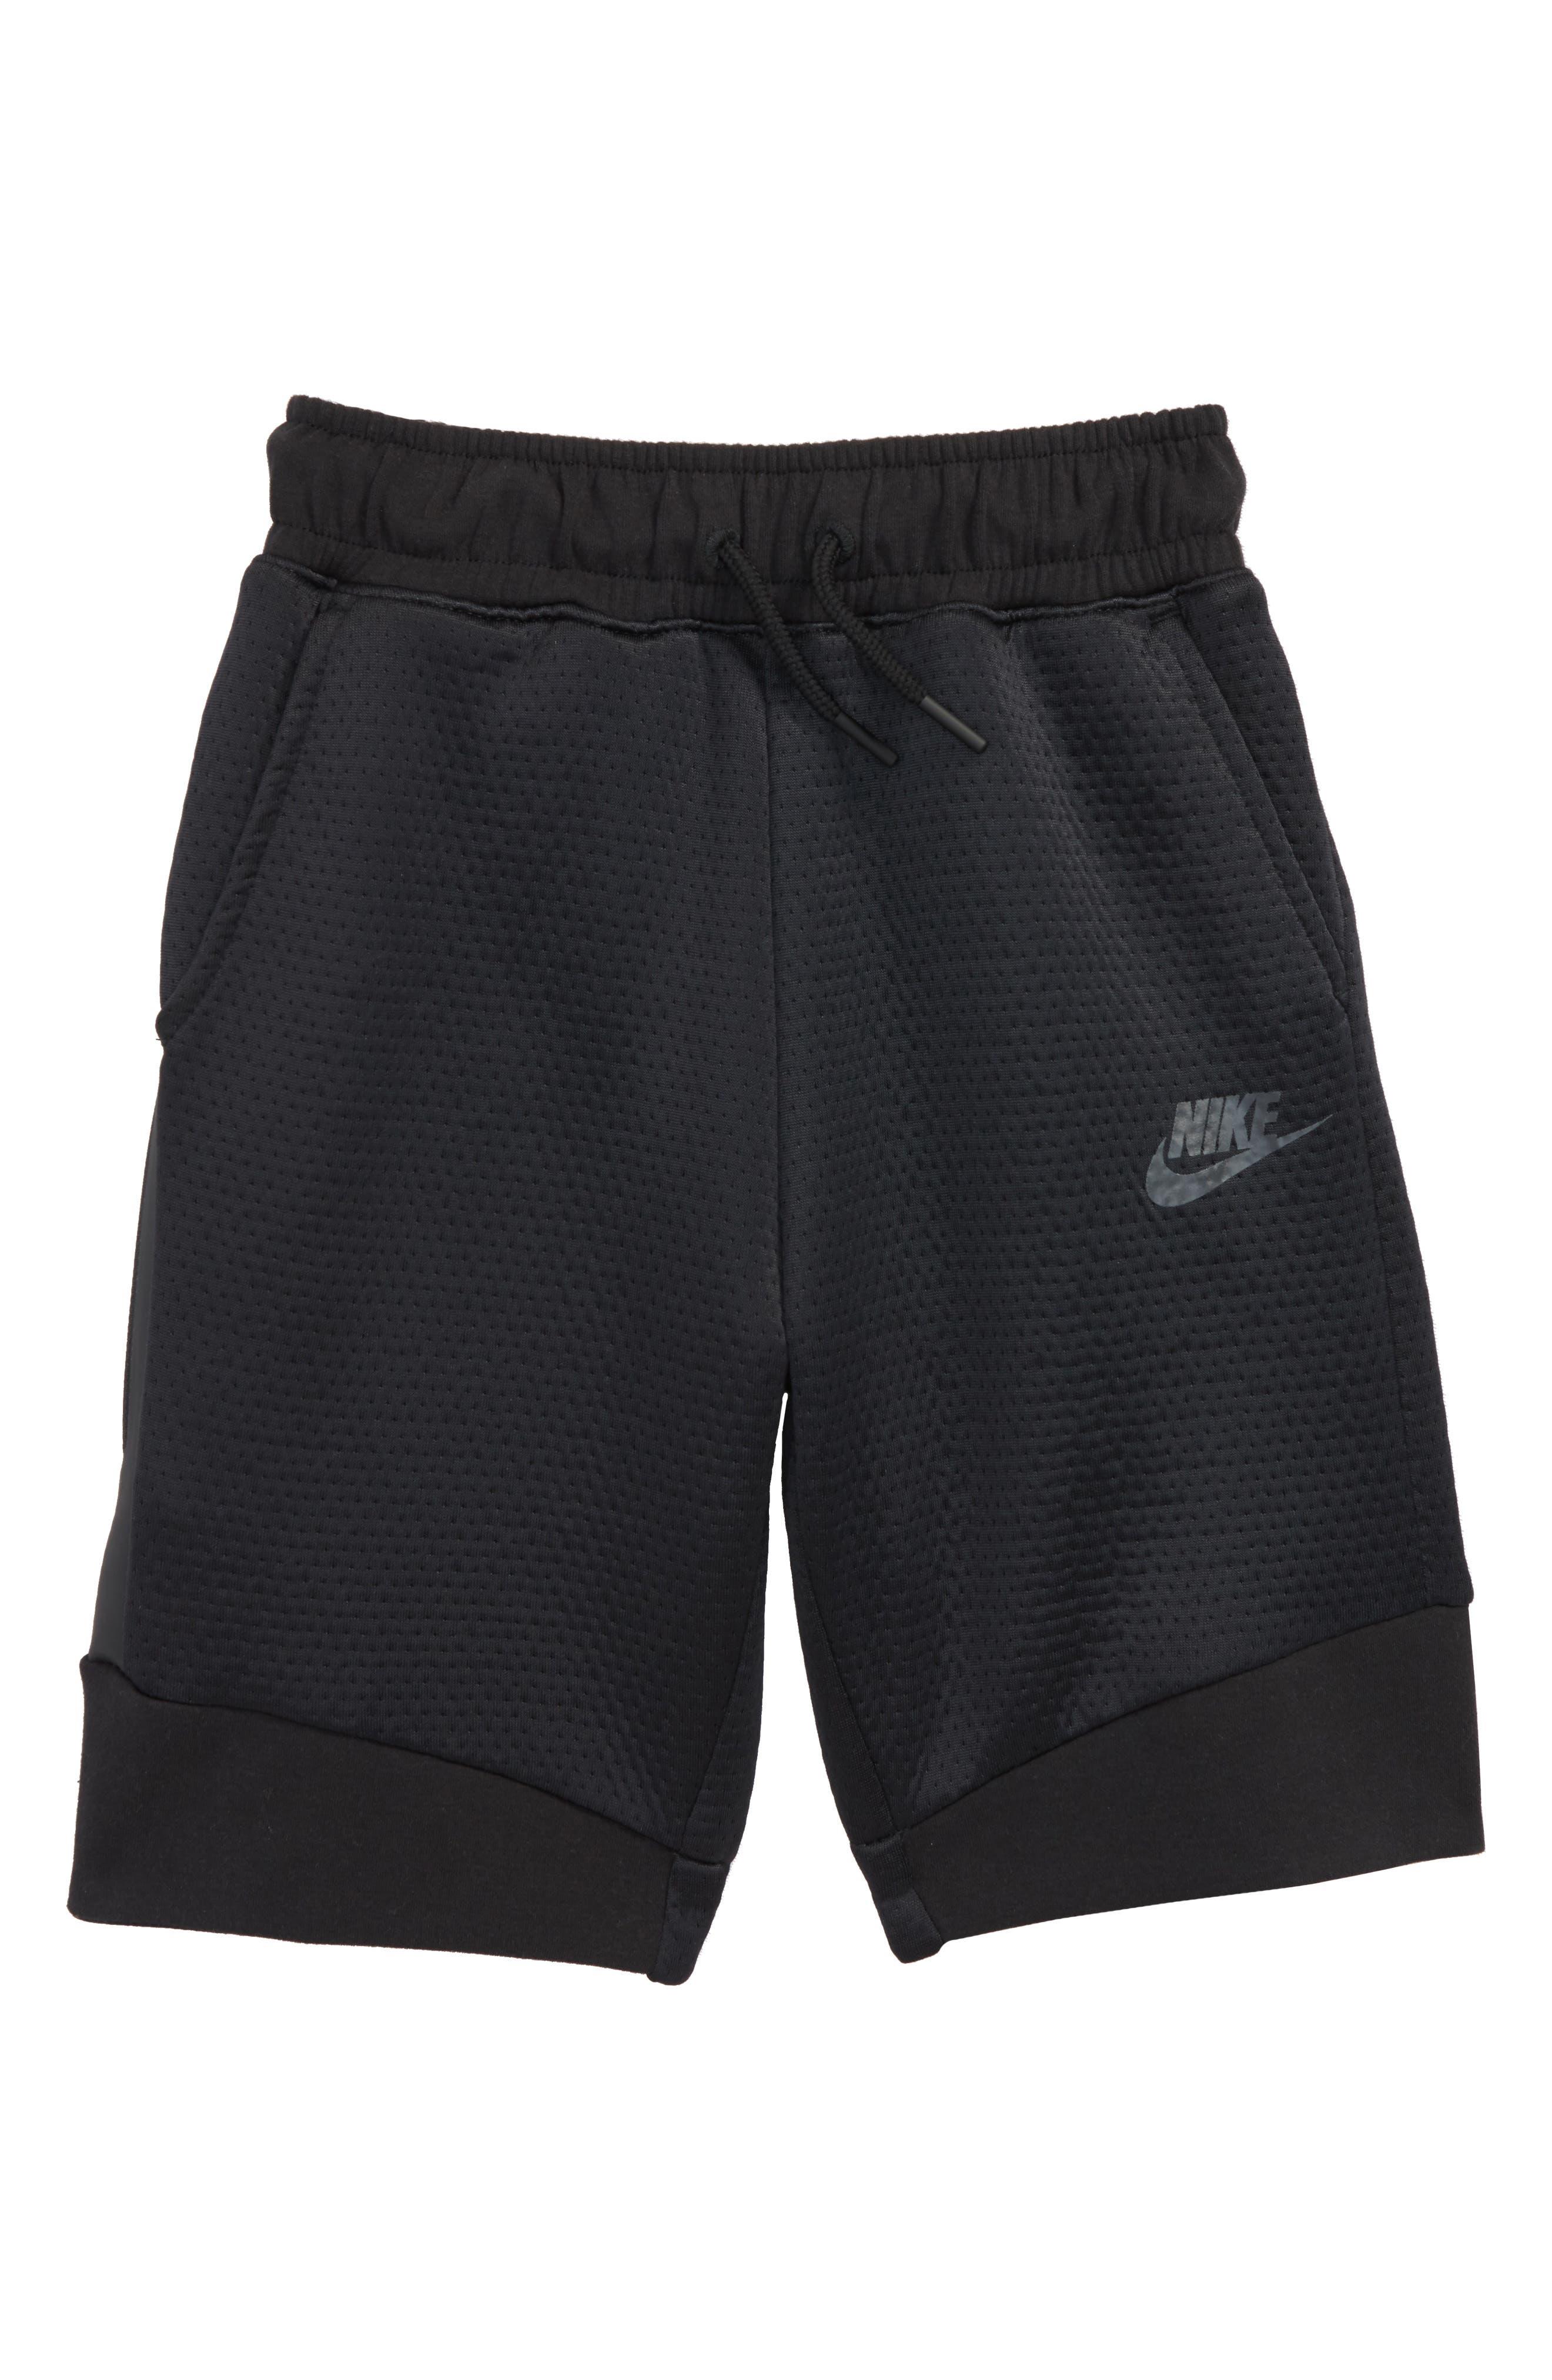 Tech Fleece Shorts,                             Main thumbnail 1, color,                             004